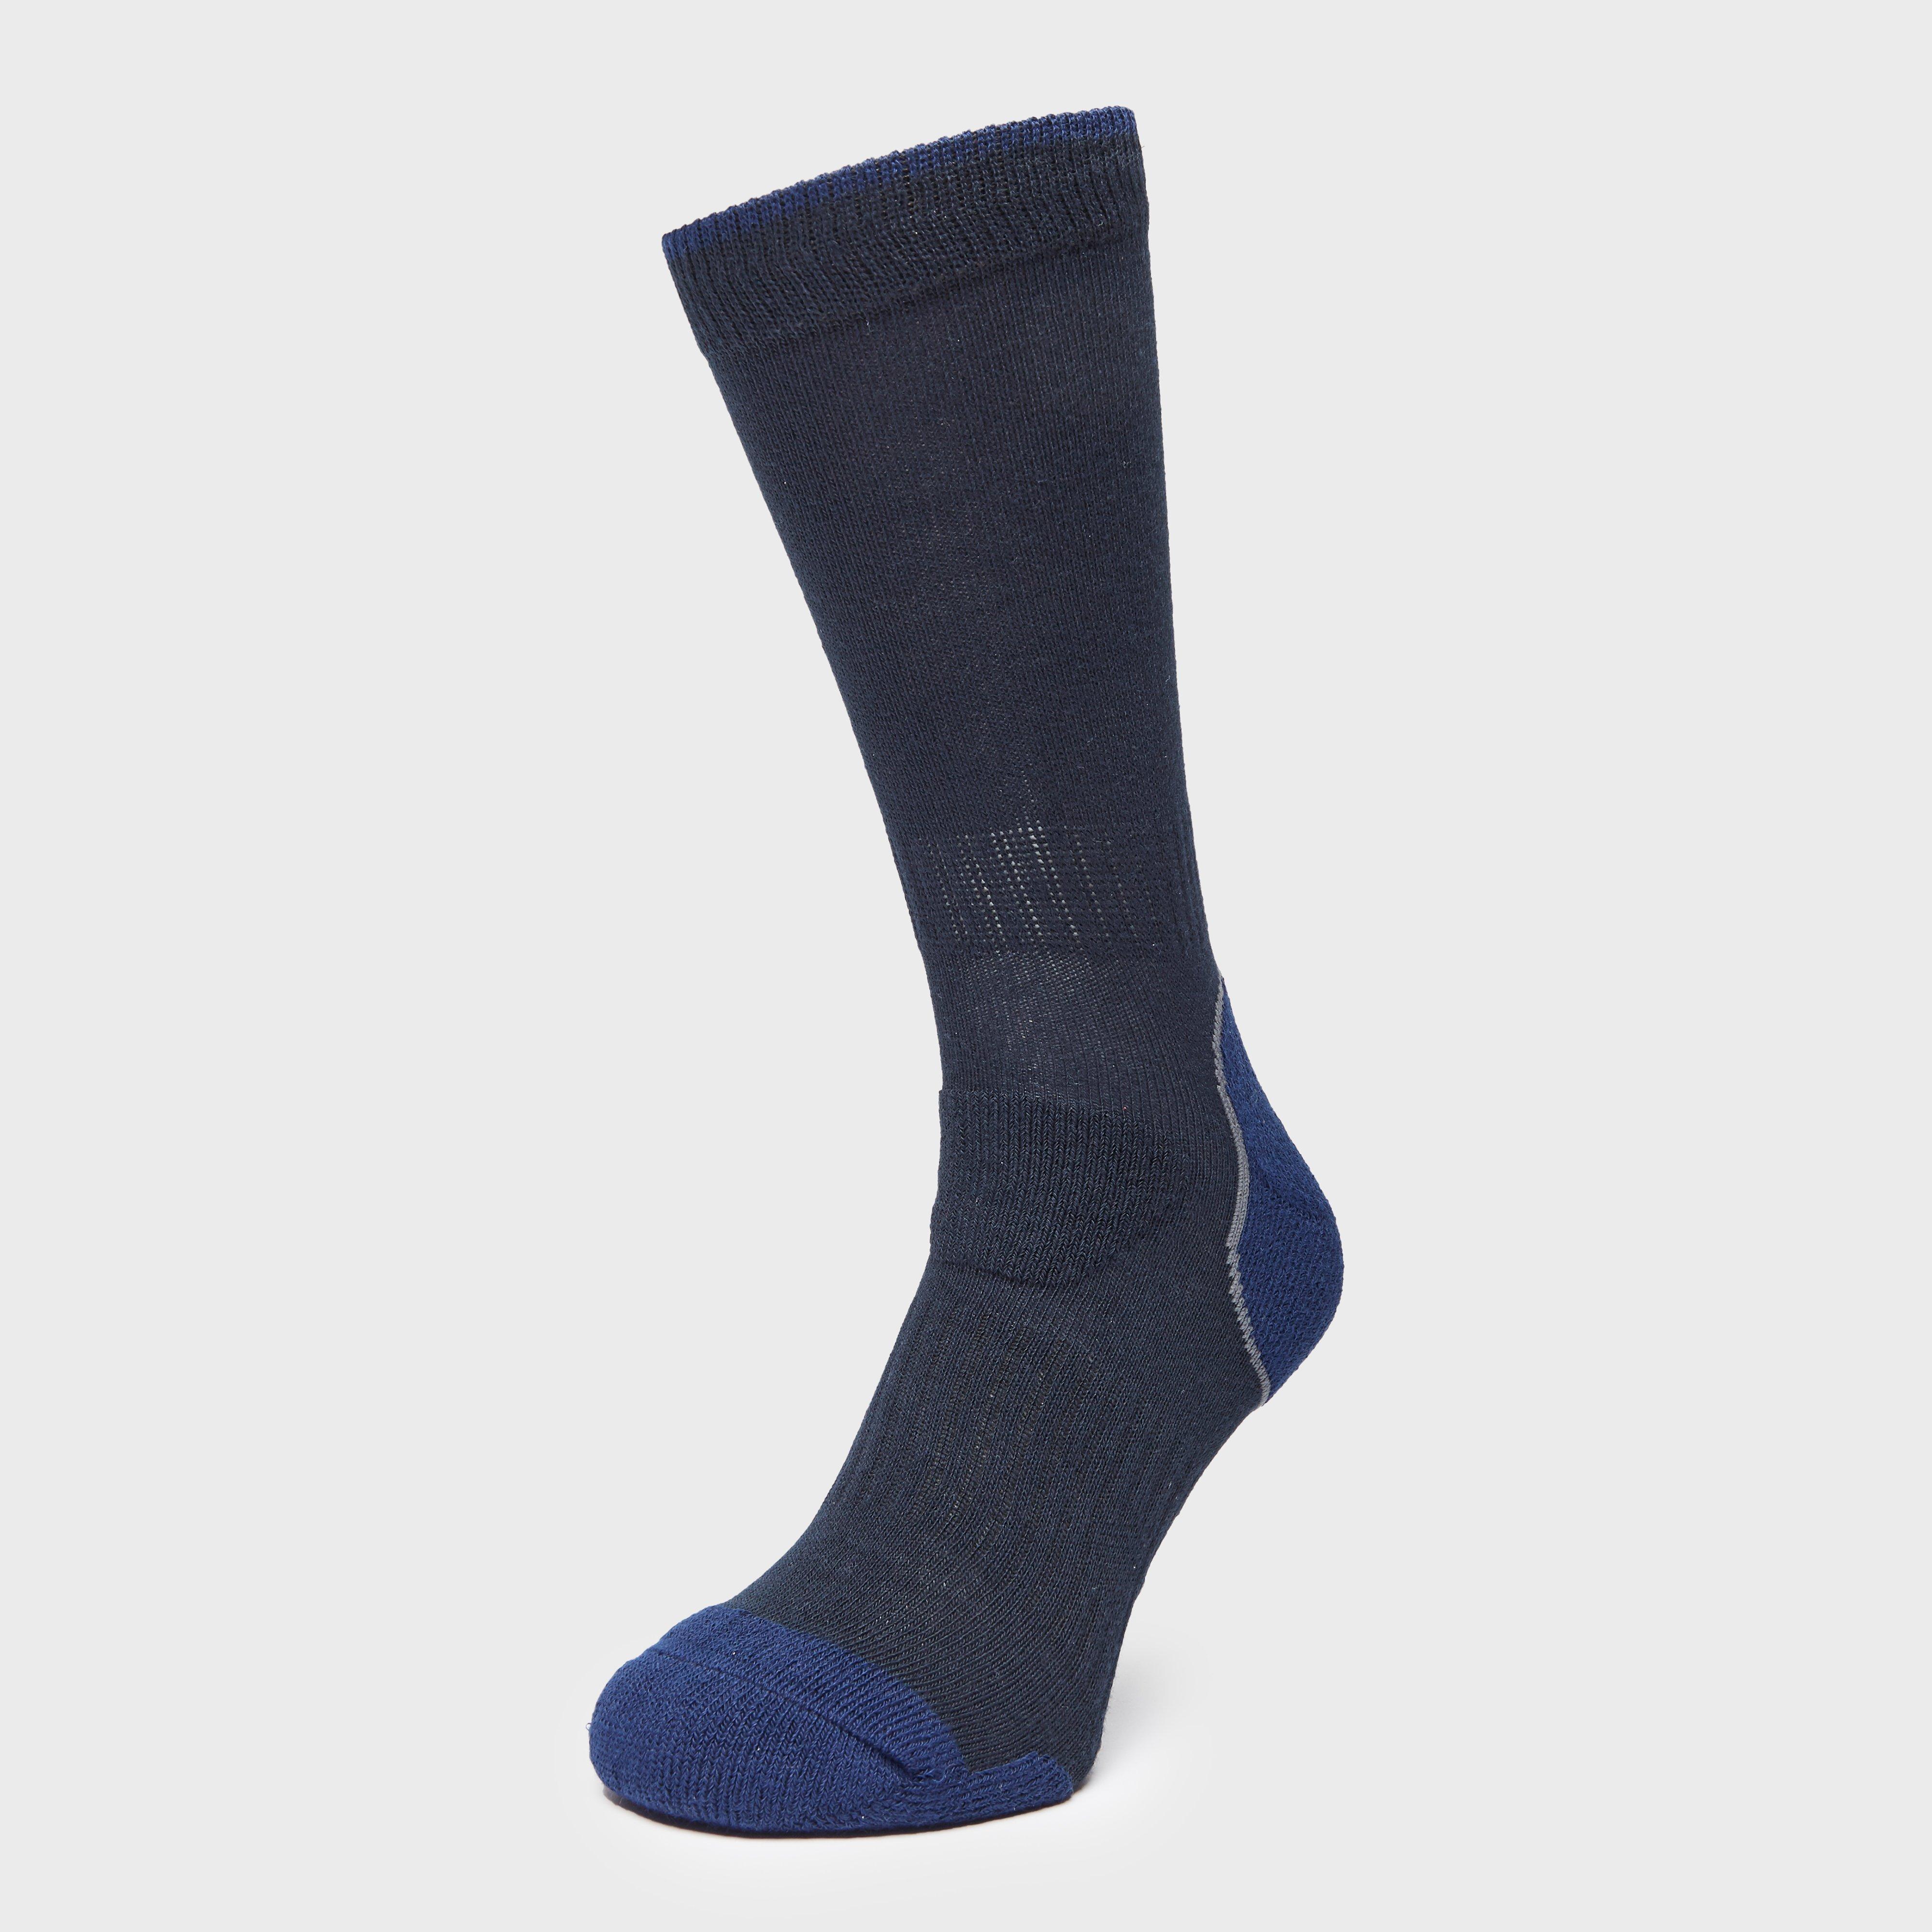 Brasher Mens Light Hiker Socks - Navy/blu  Navy/blu